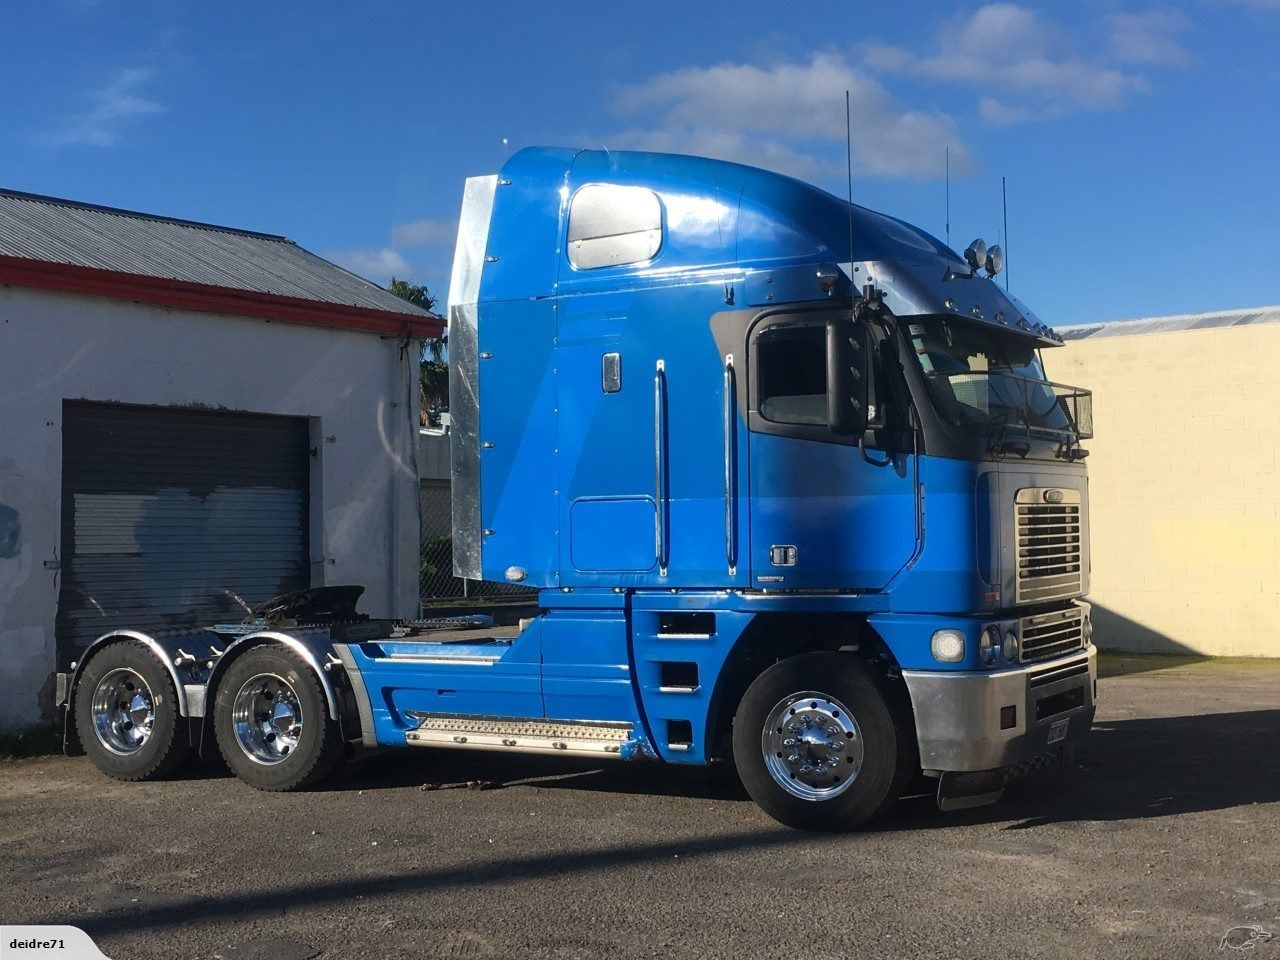 2006 Freightliner Argosy 6x4 T Unit Freightliner Big Rig Trucks Trucks And Girls